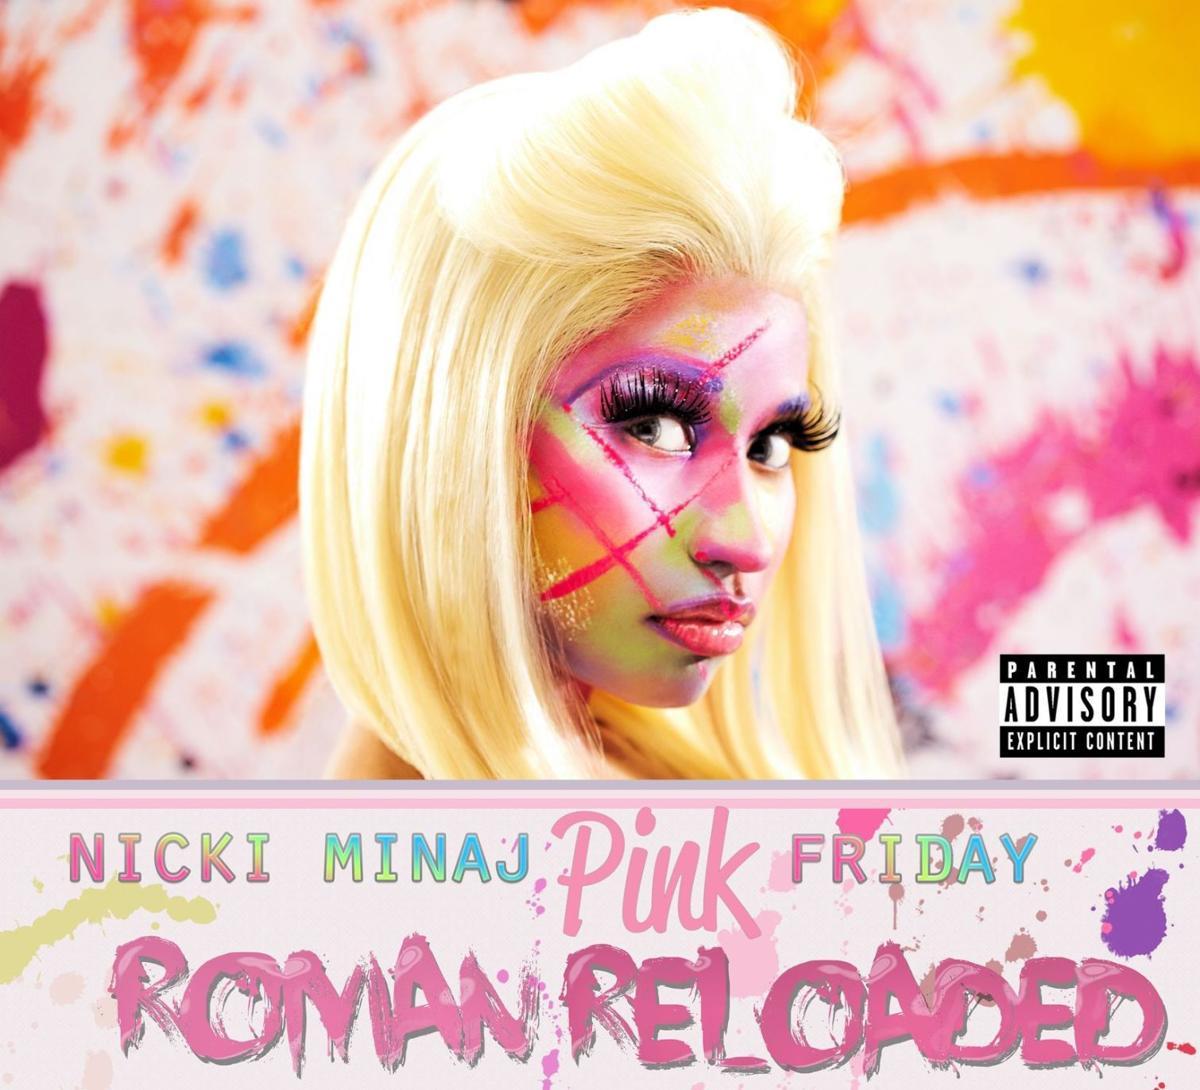 Minaj packs a punch with CD